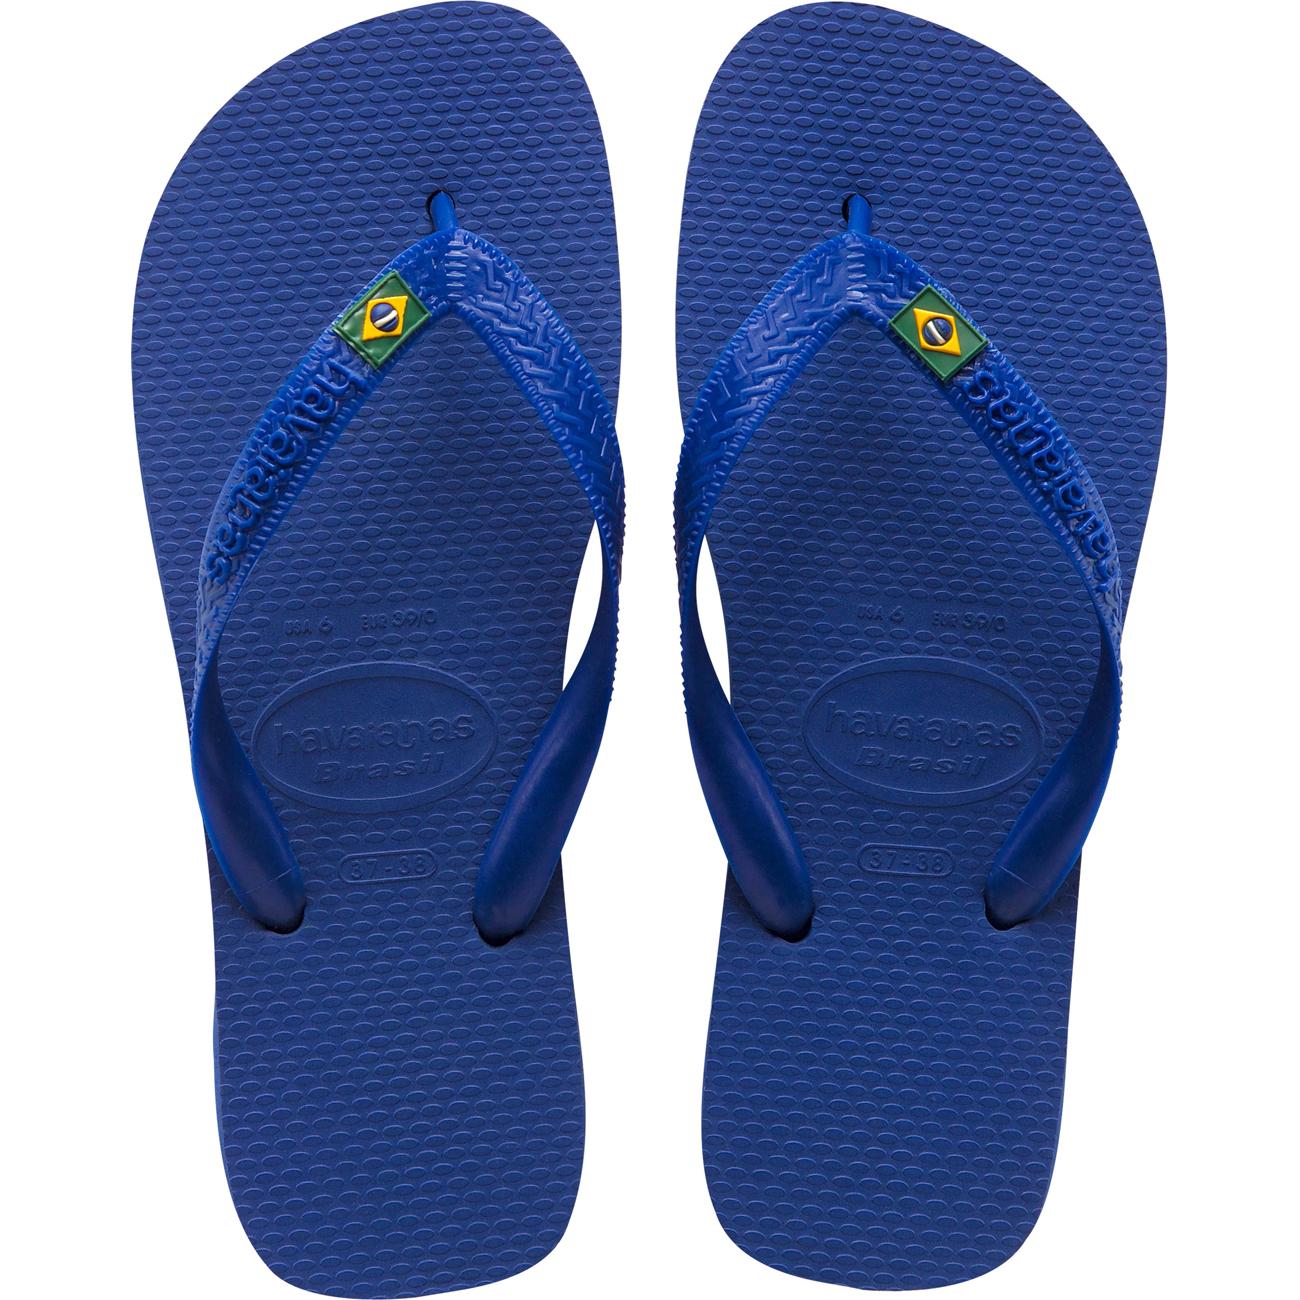 Sandalia Havaianas Brasil Azul Naval 45/6